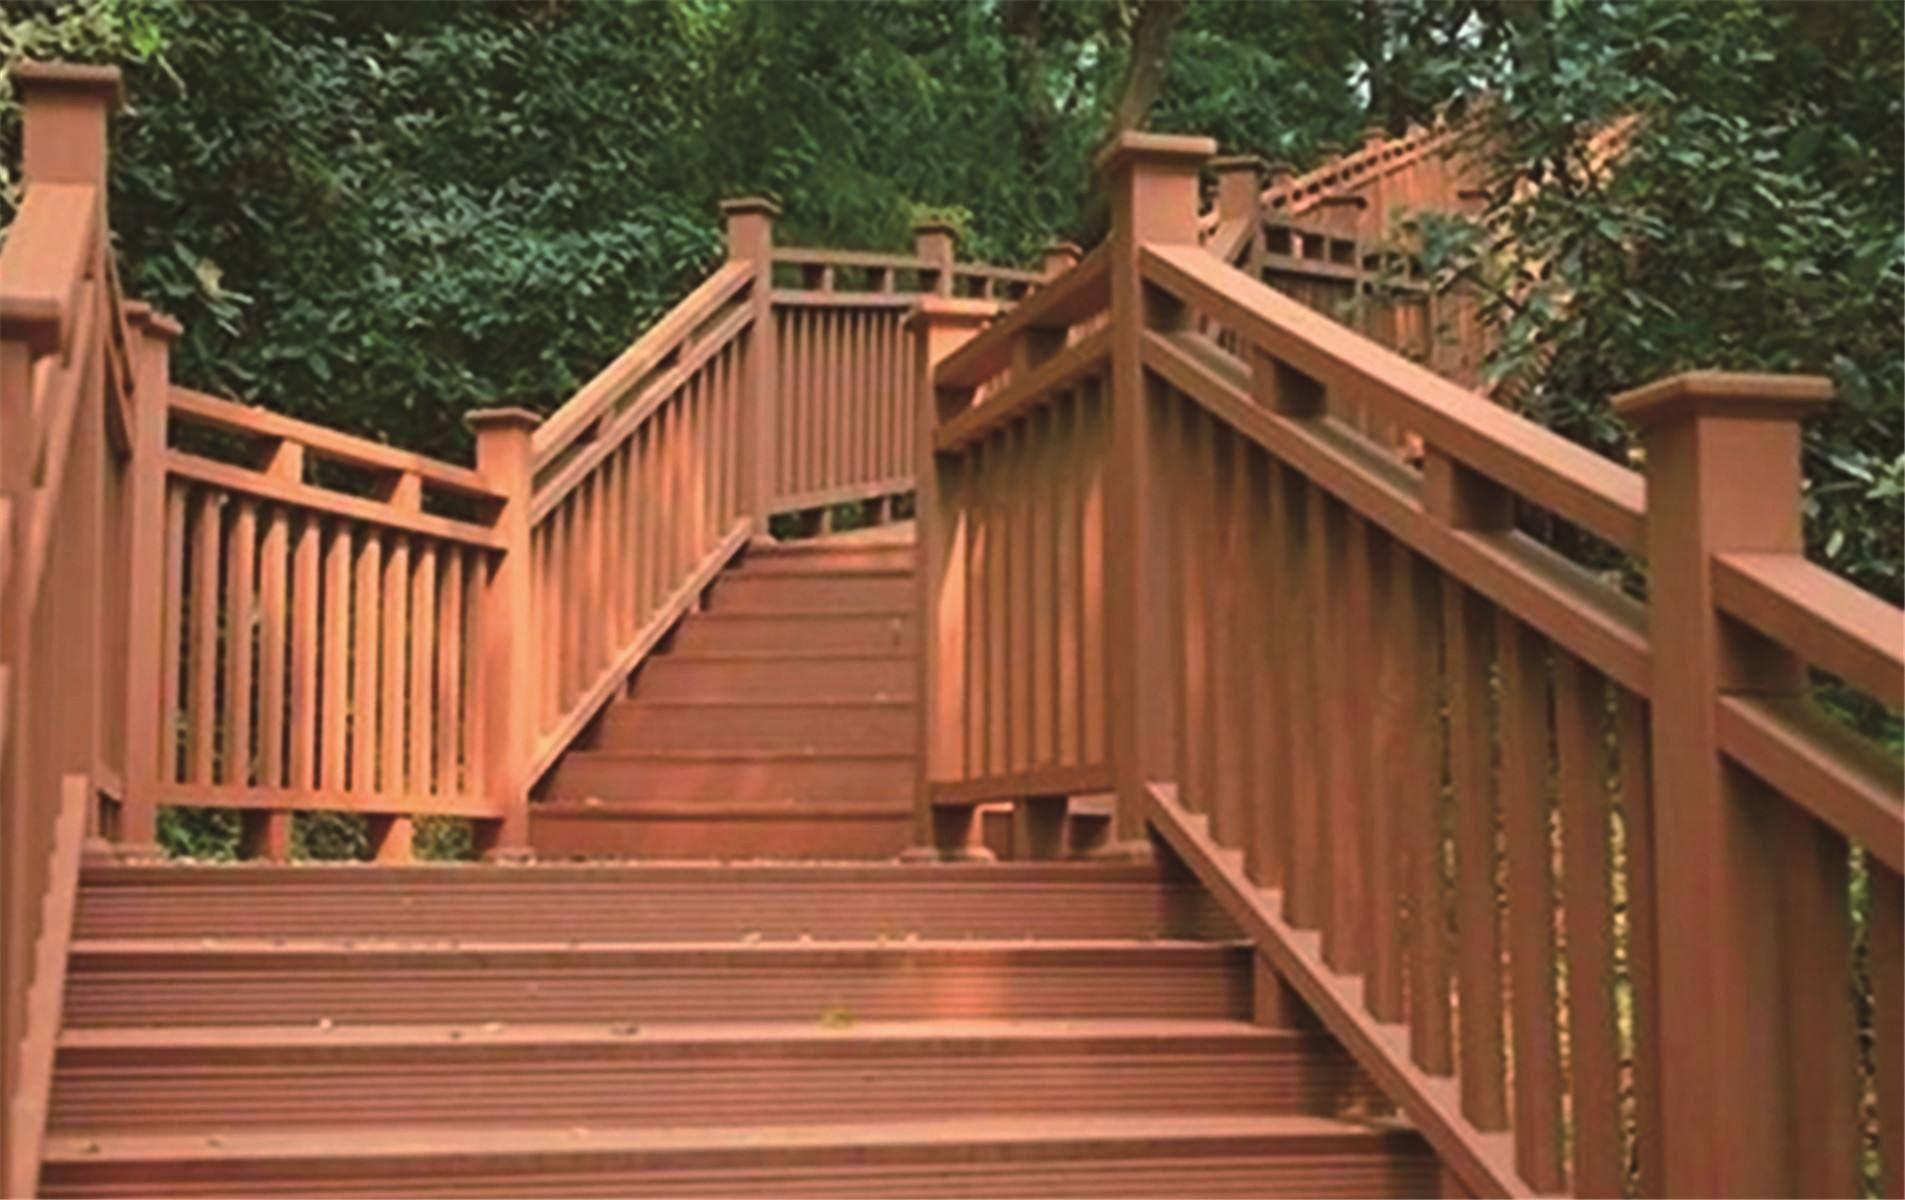 Patio Deck Cost Per Square Foot Price Building A Deck Deck Building Cost Deck